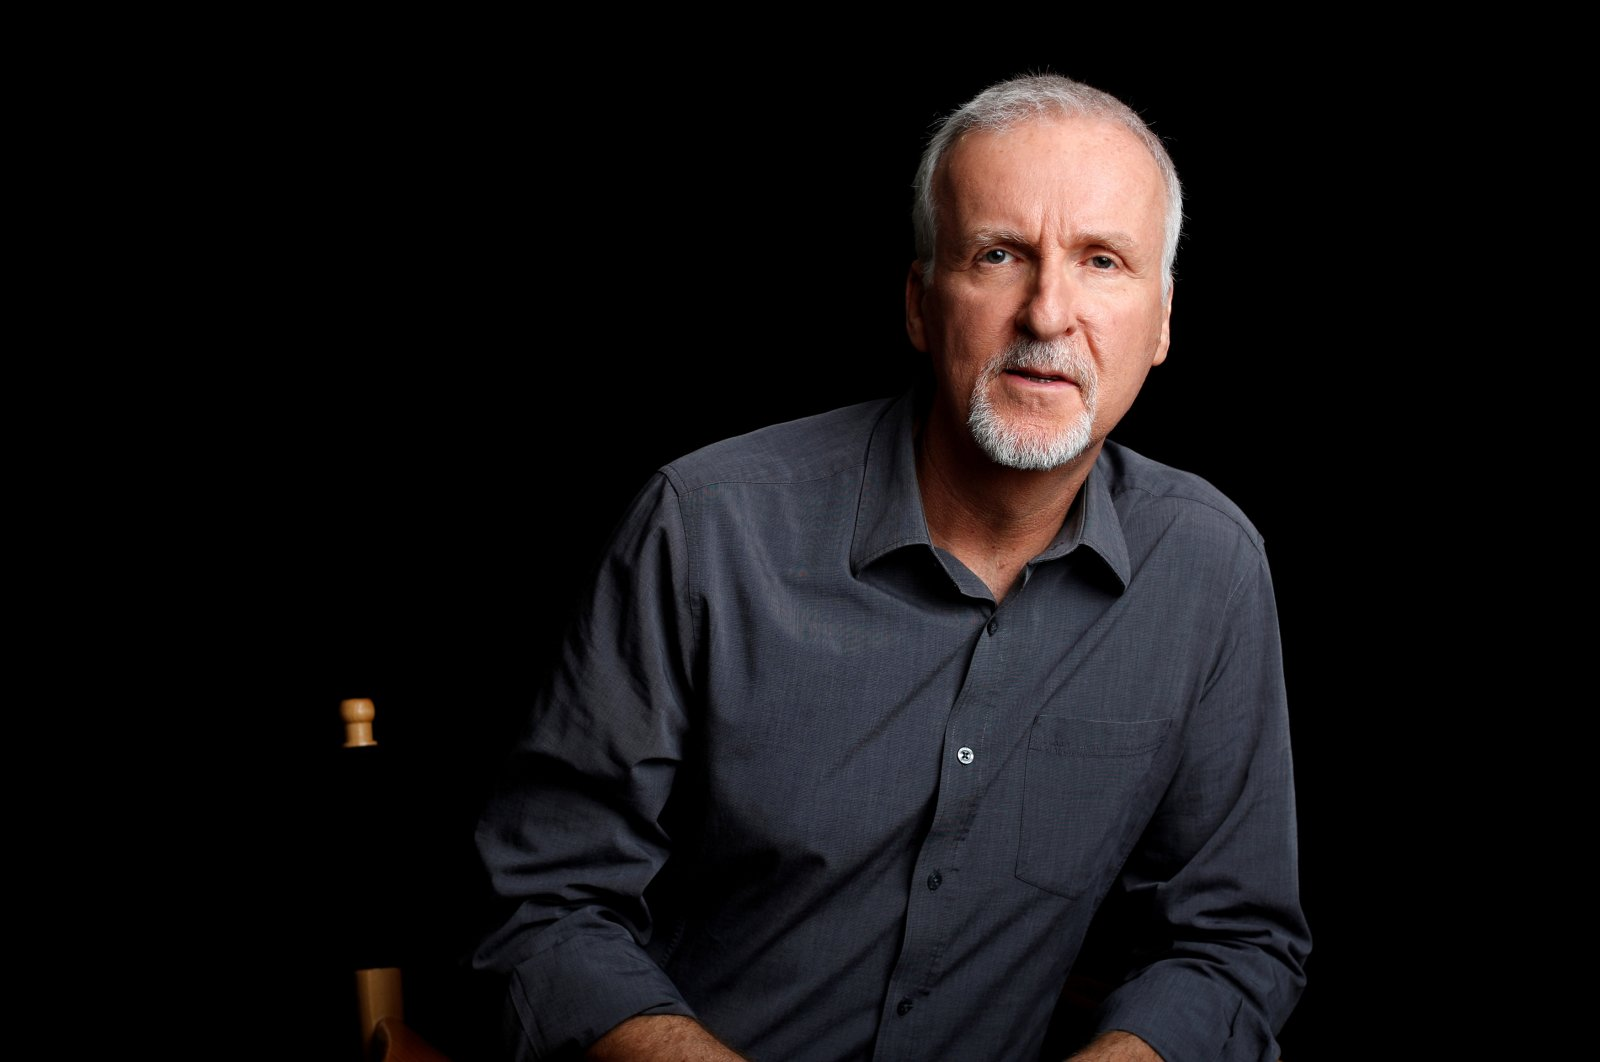 Director James Cameron poses for a portrait in Manhattan Beach, California, April 8, 2014. (Reuters Photo)